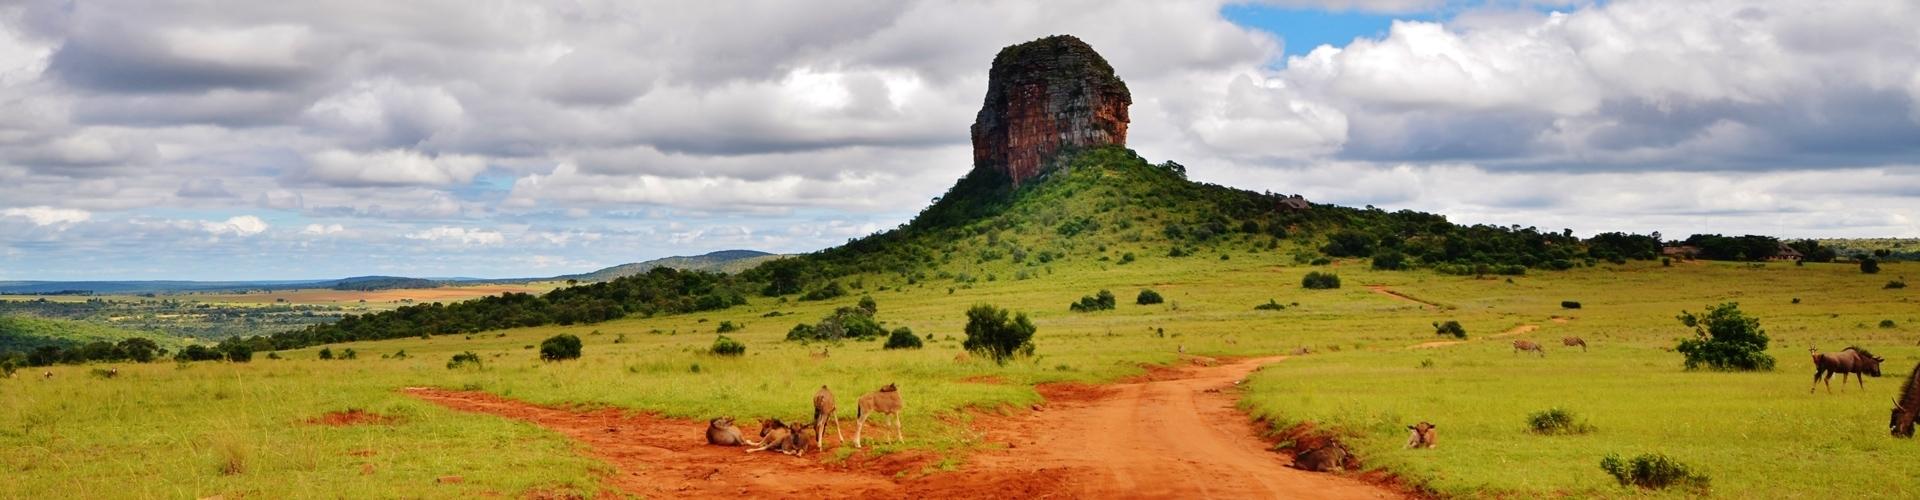 entabeni-private-game-reserve-safari-informatie-zuid-afrika-1920x500-1